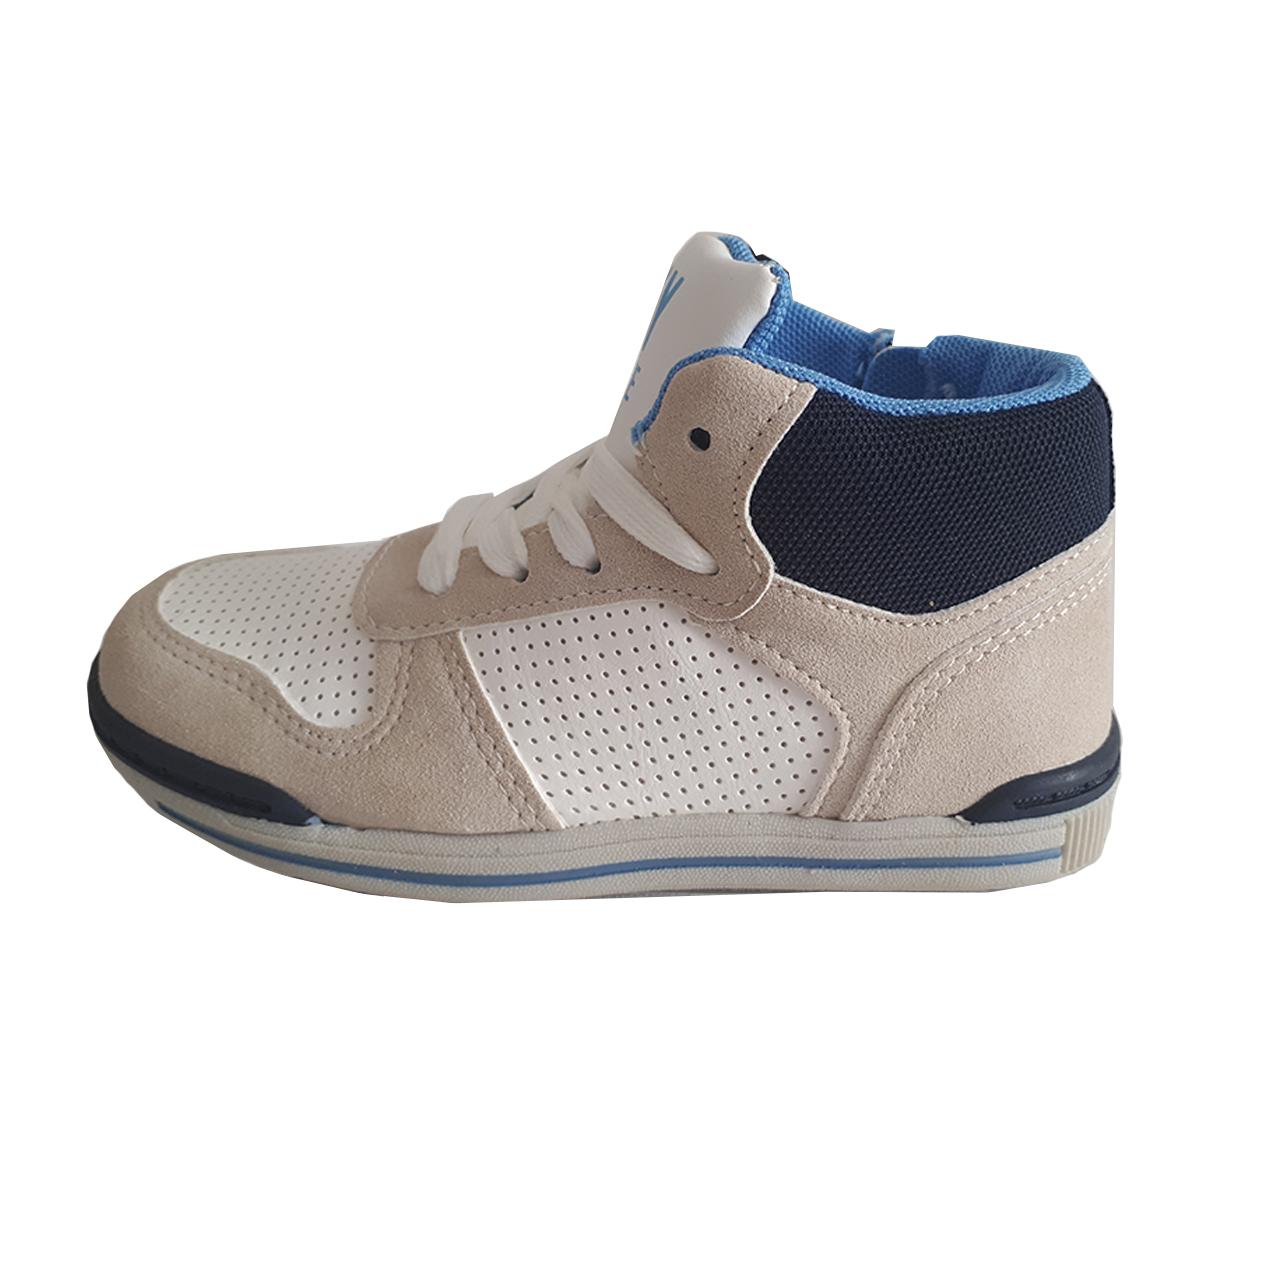 کفش راحتی لوپیلو کد LUPJUNSN